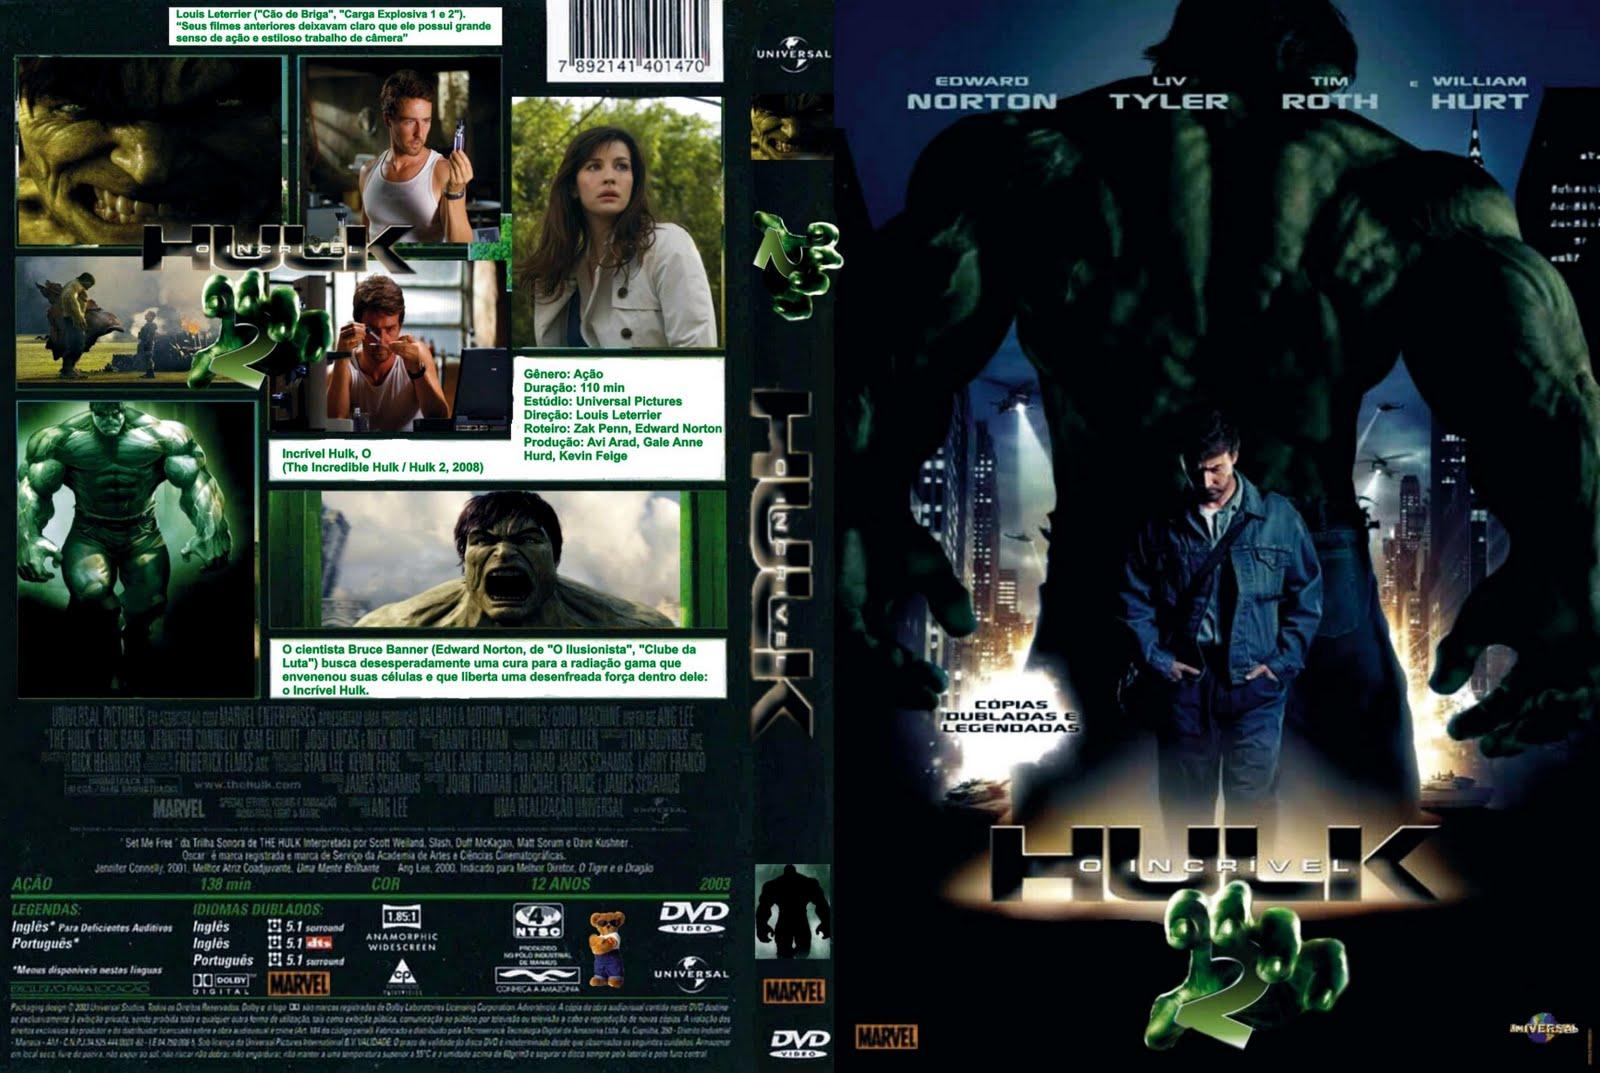 Incrivel Hulck Classy dj vini troca & venda de filmes: o incrivel hulk 2